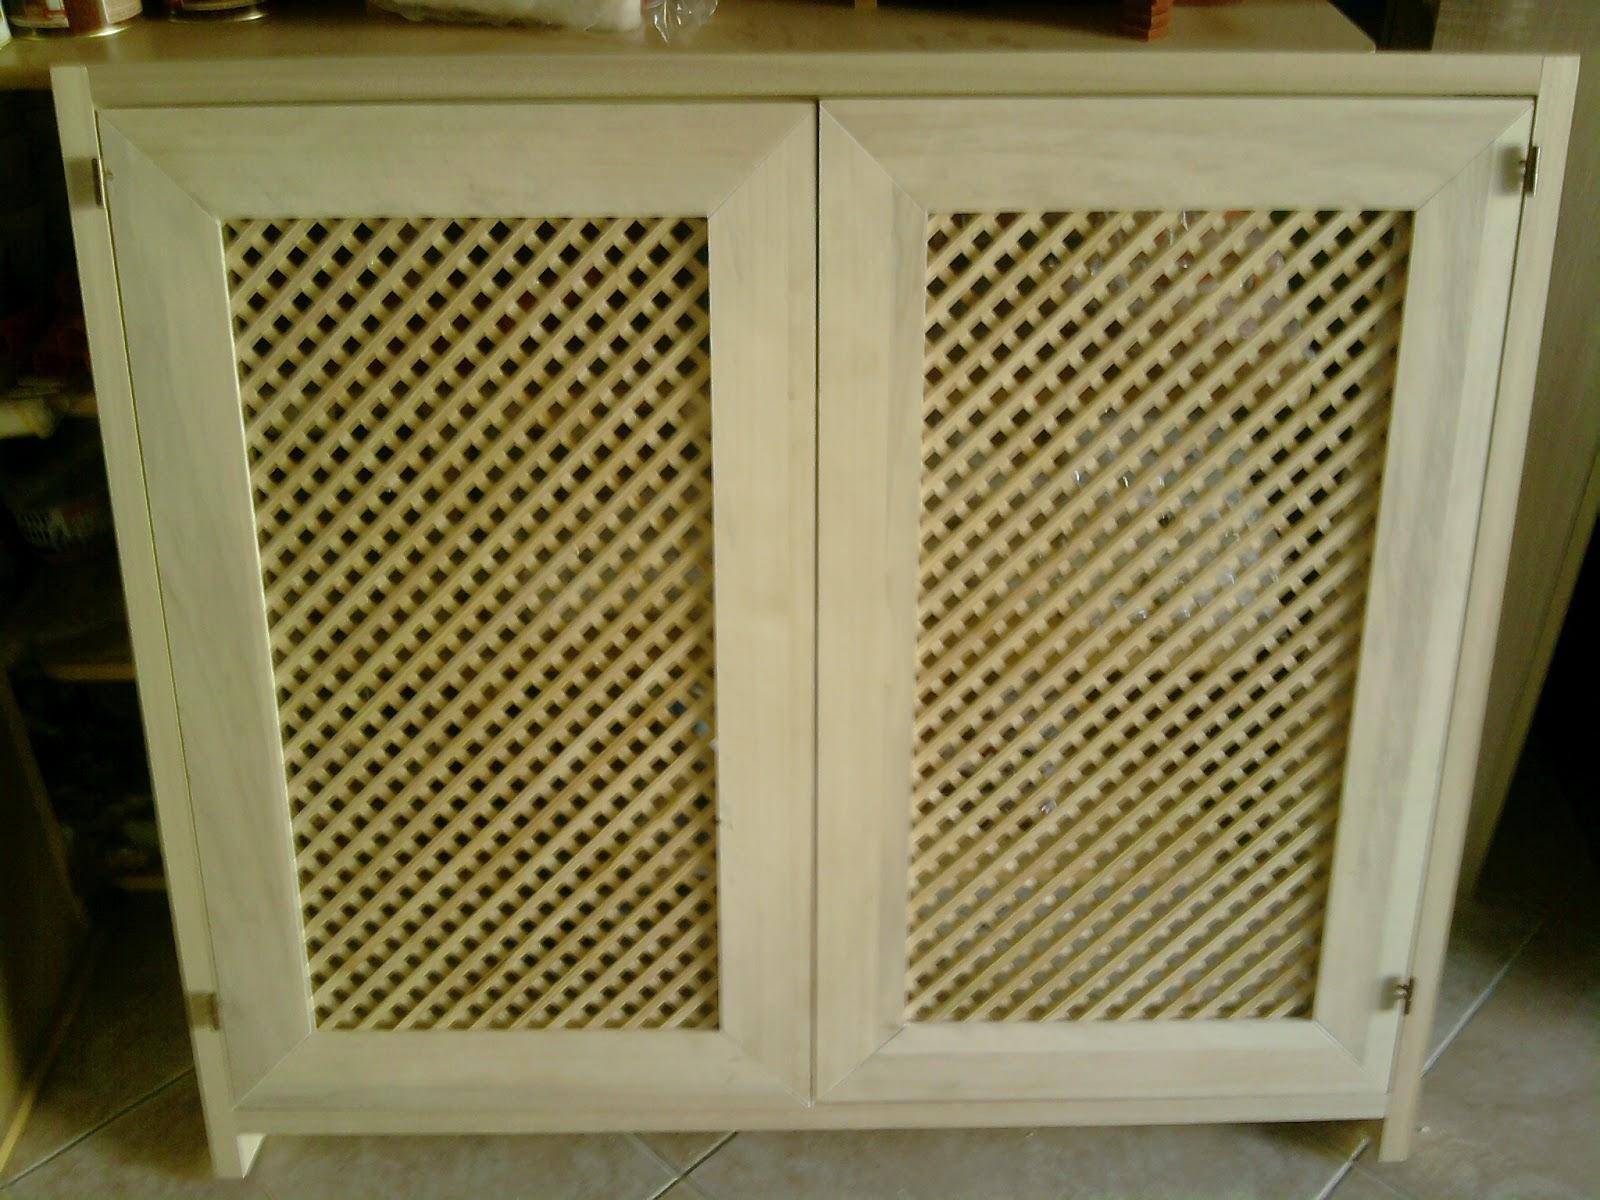 Fai da te hobby legno ante con griglia - Ante mobili fai da te ...